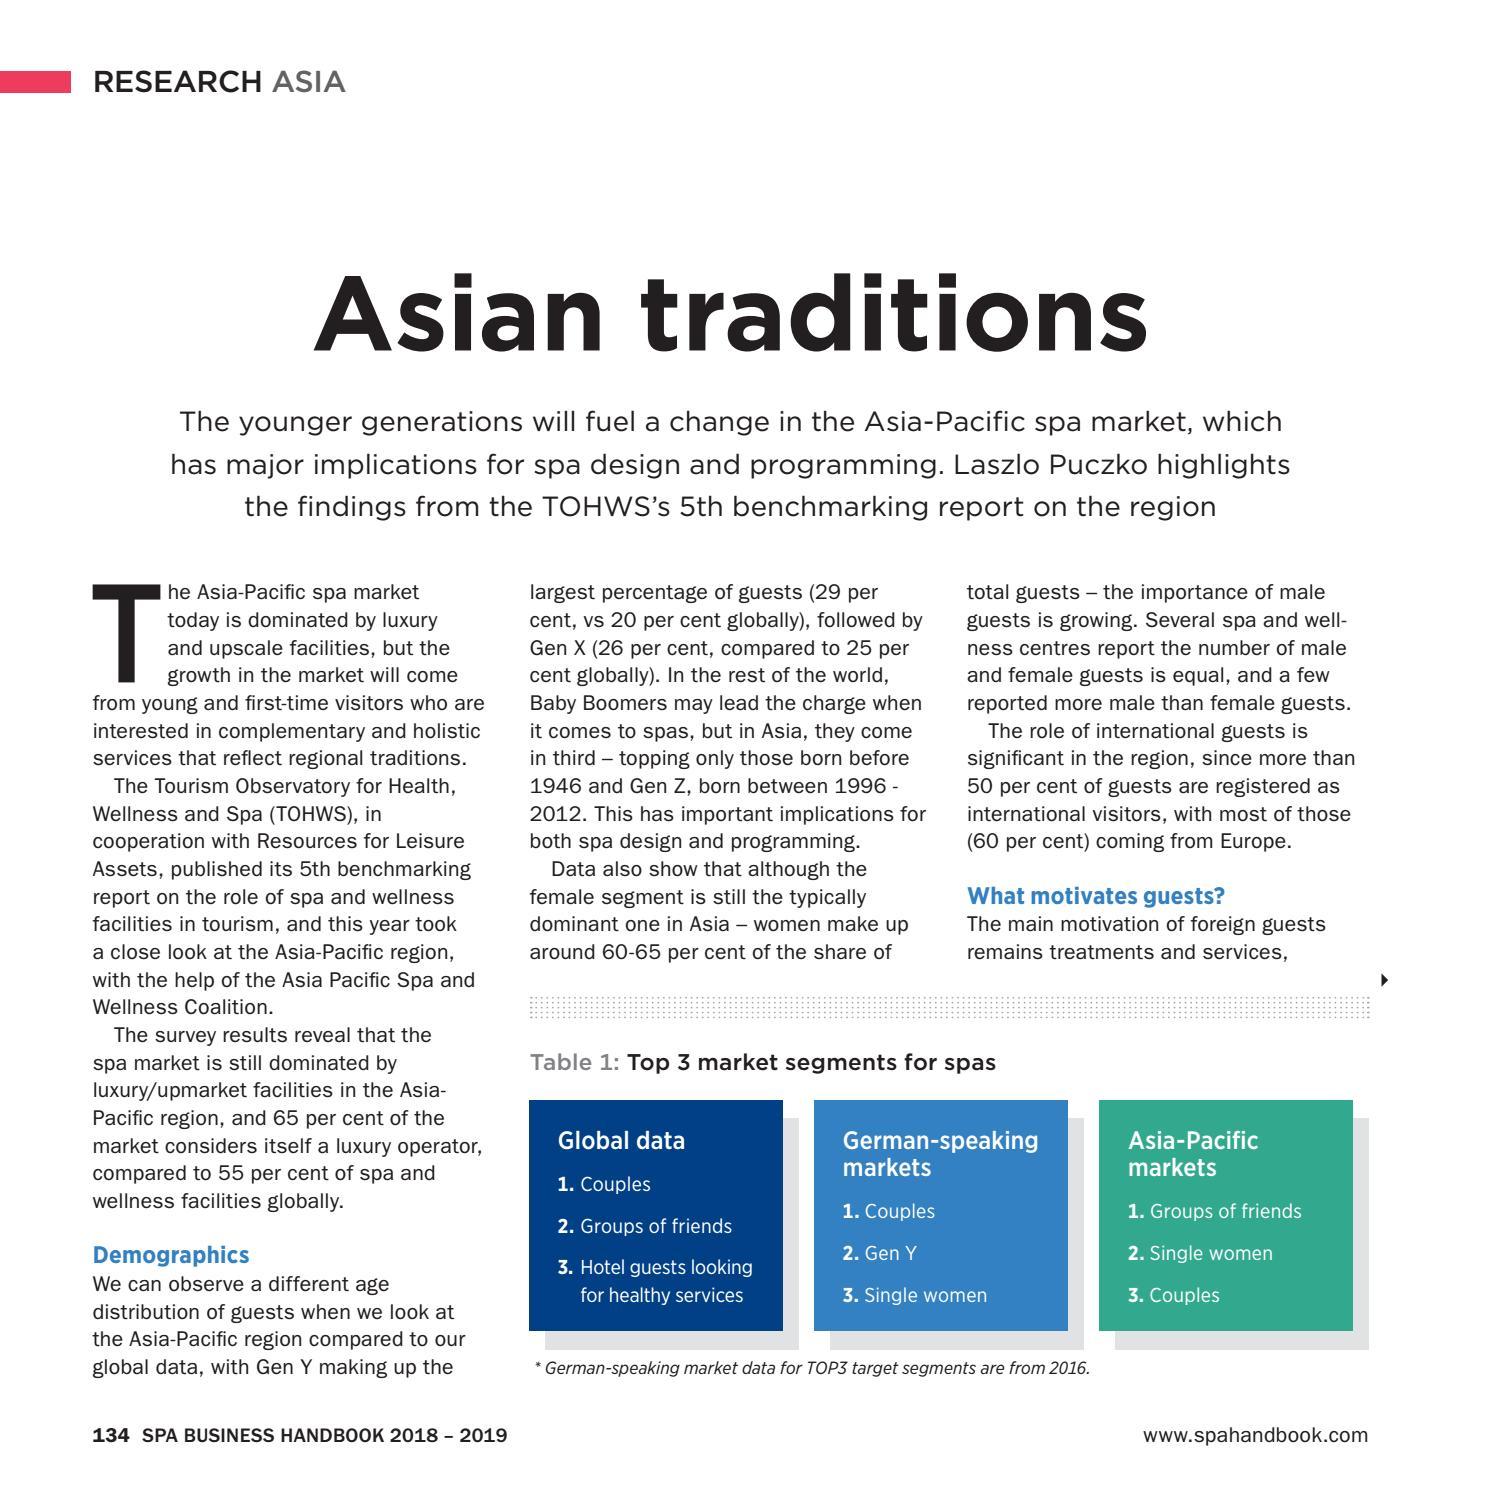 Spa Business Handbook 2018-2019 by Leisure Media - issuu